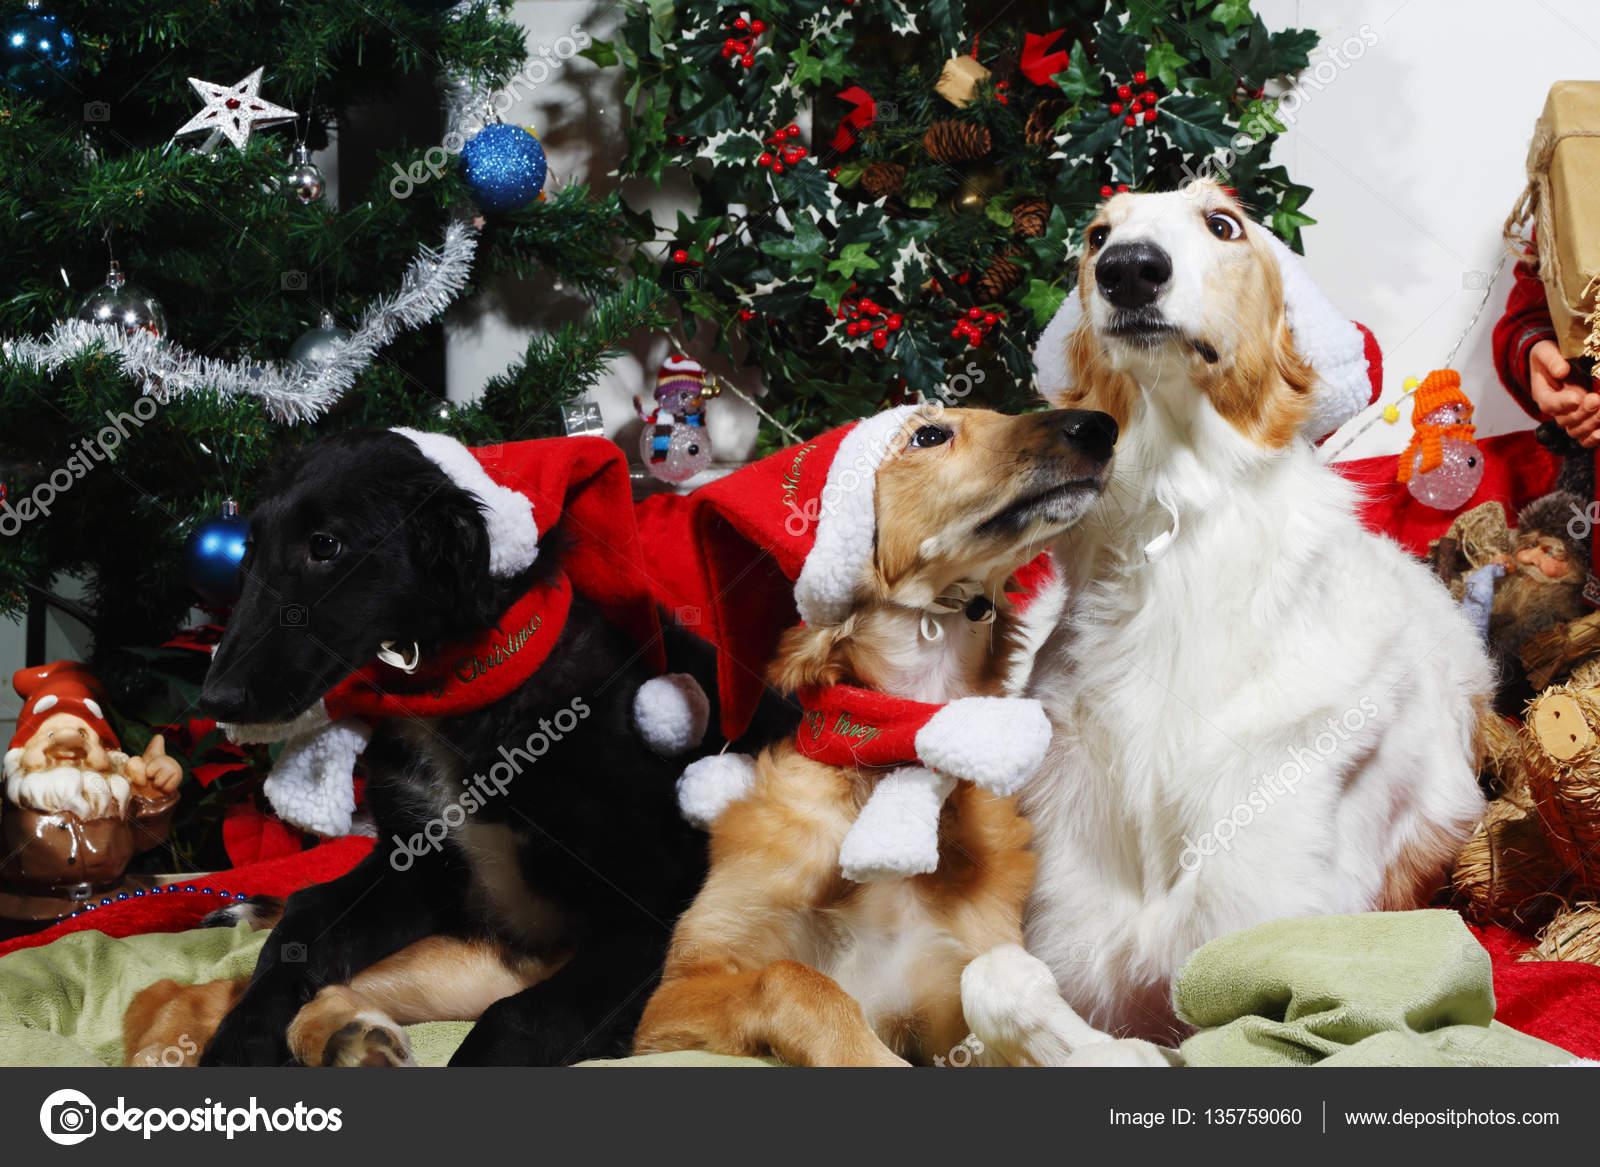 Merry Christmas Puppies.Three Borzoi Puppies Wishing Merry Christmas Stock Photo